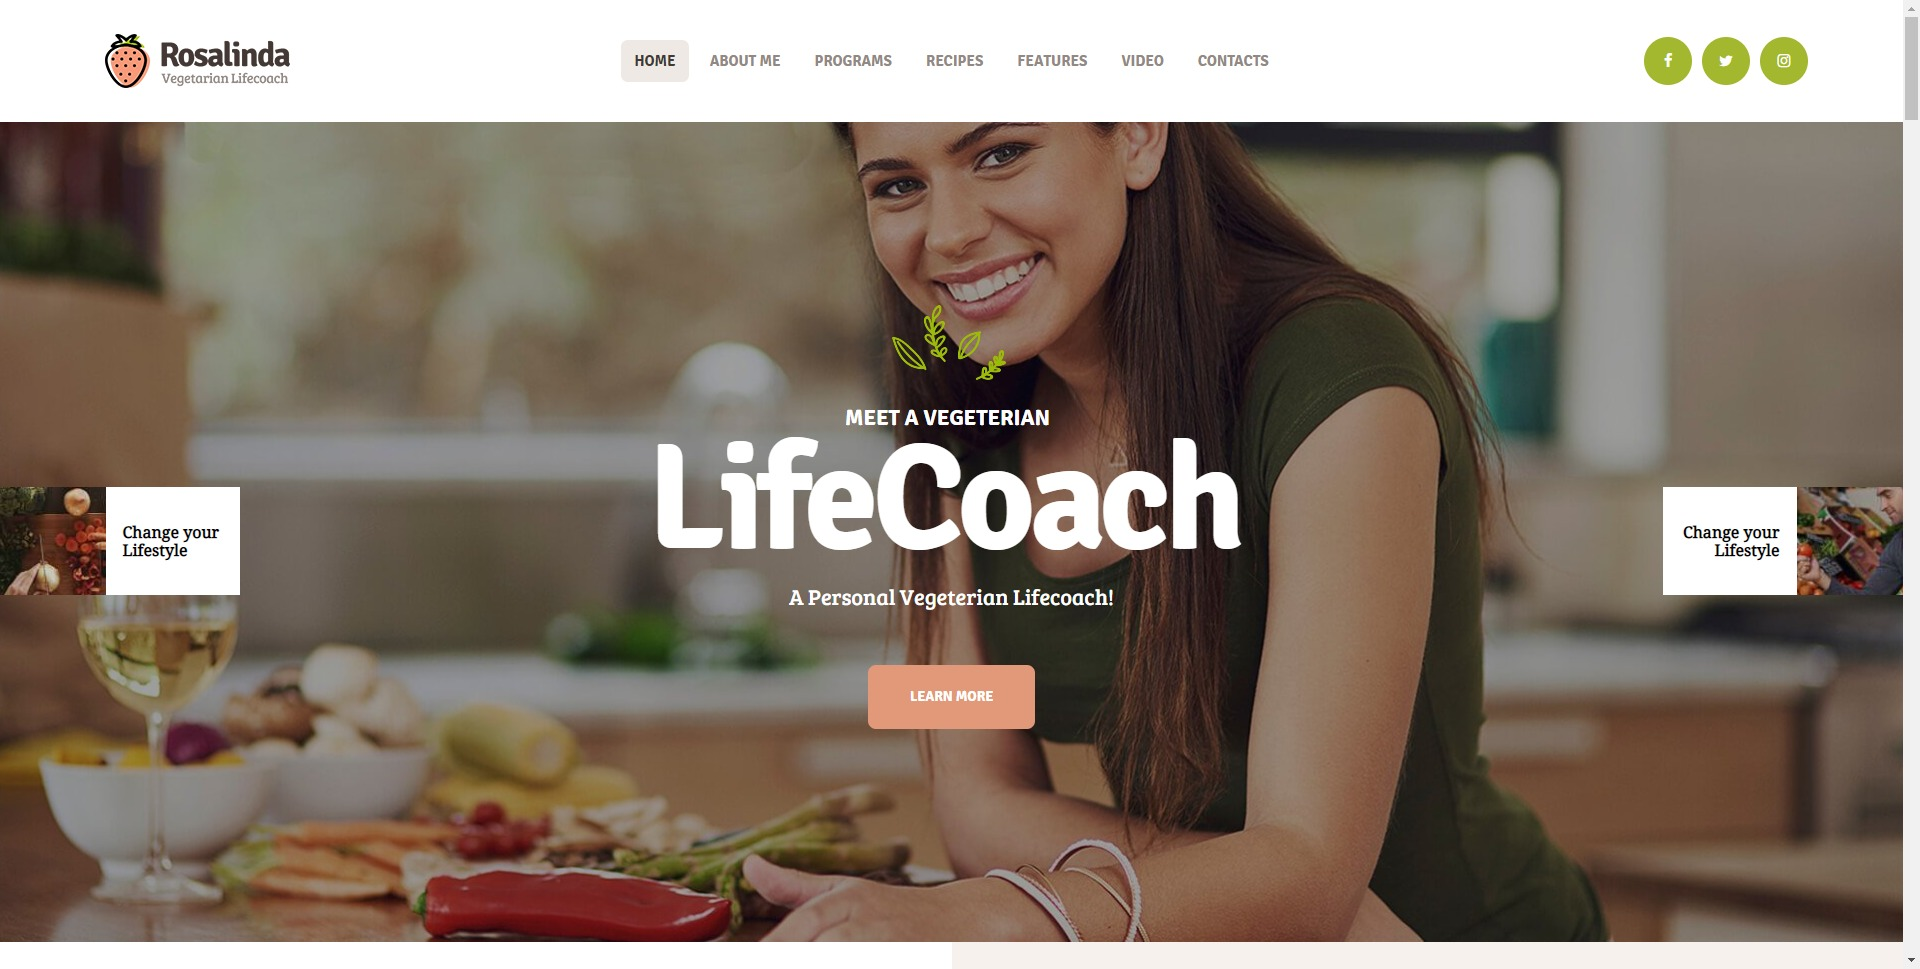 Rosalinda-健康食品营养师健康烹饪WordPress主题